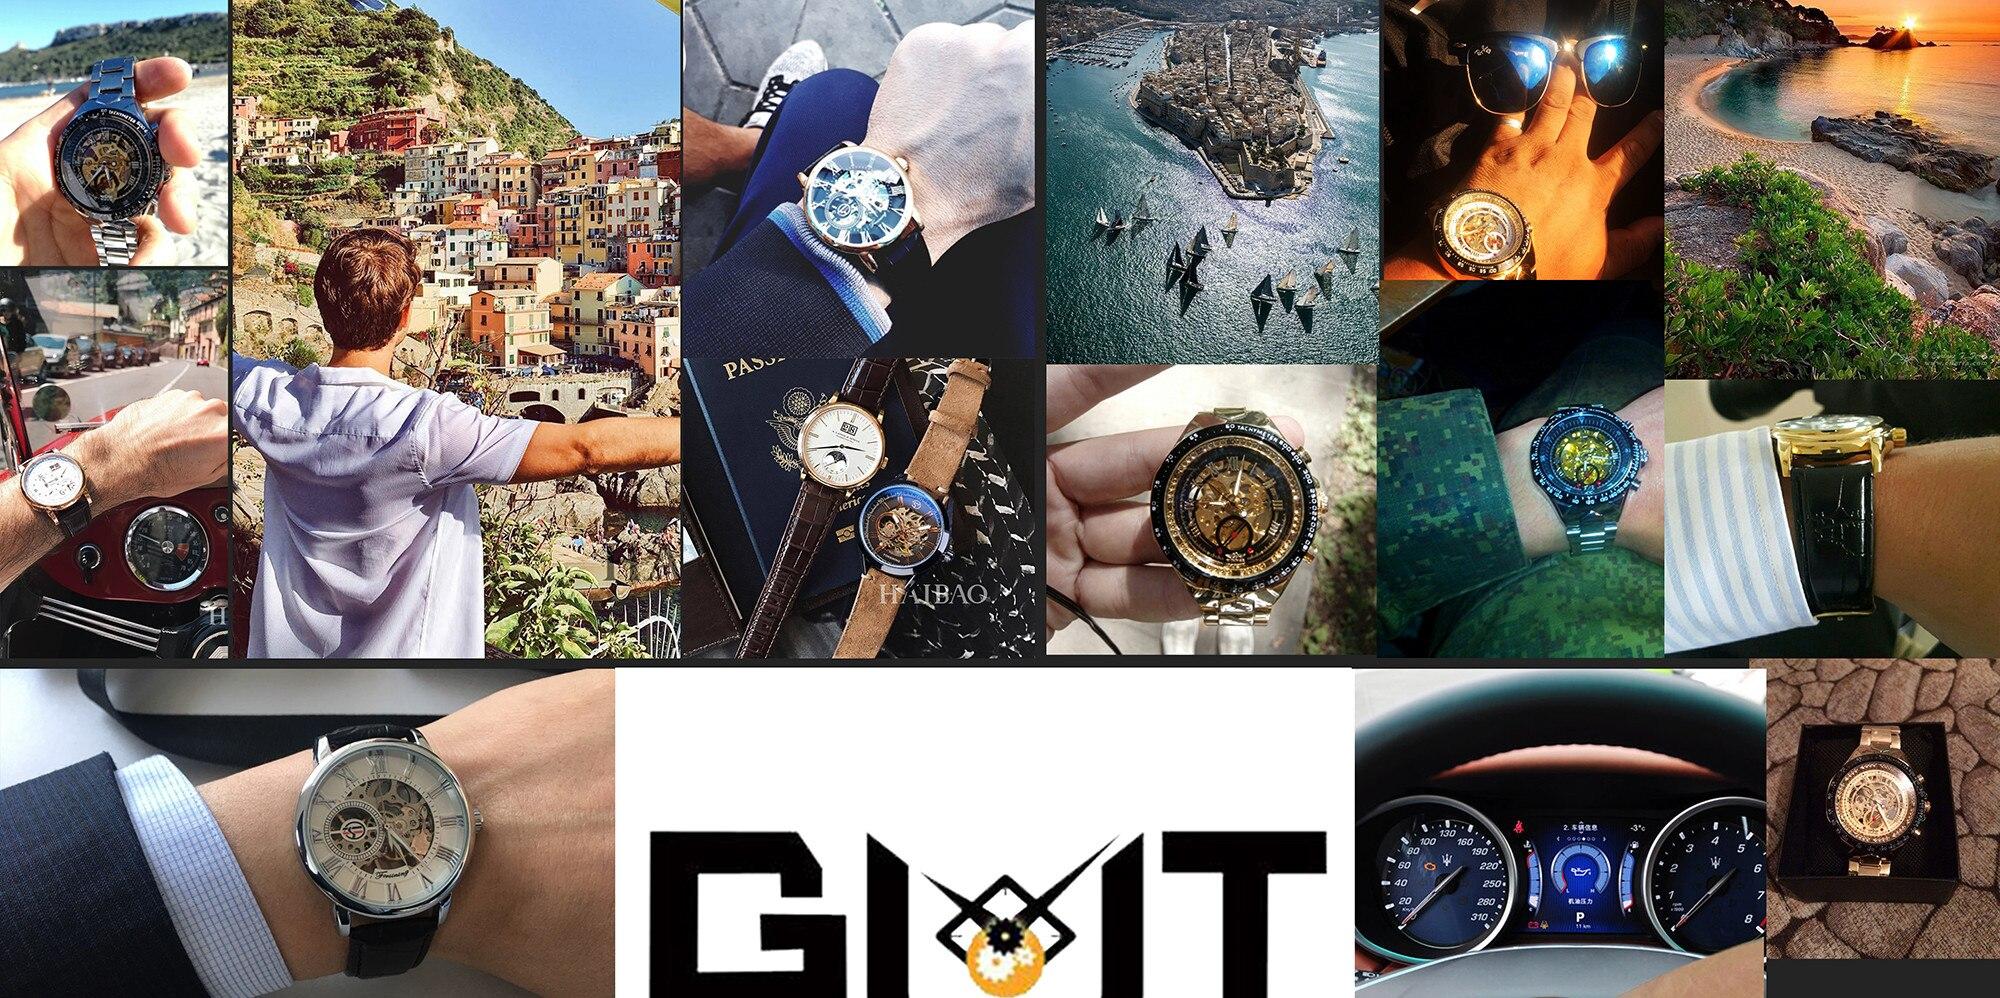 HTB1FVqUdLMTUeJjSZFKq6ygopXab Winner Golden Watches Classic Rhinestone Clock Roman Analog Male Skeleton Clocks Automatic Mechanical Stainless Steel Band Watch